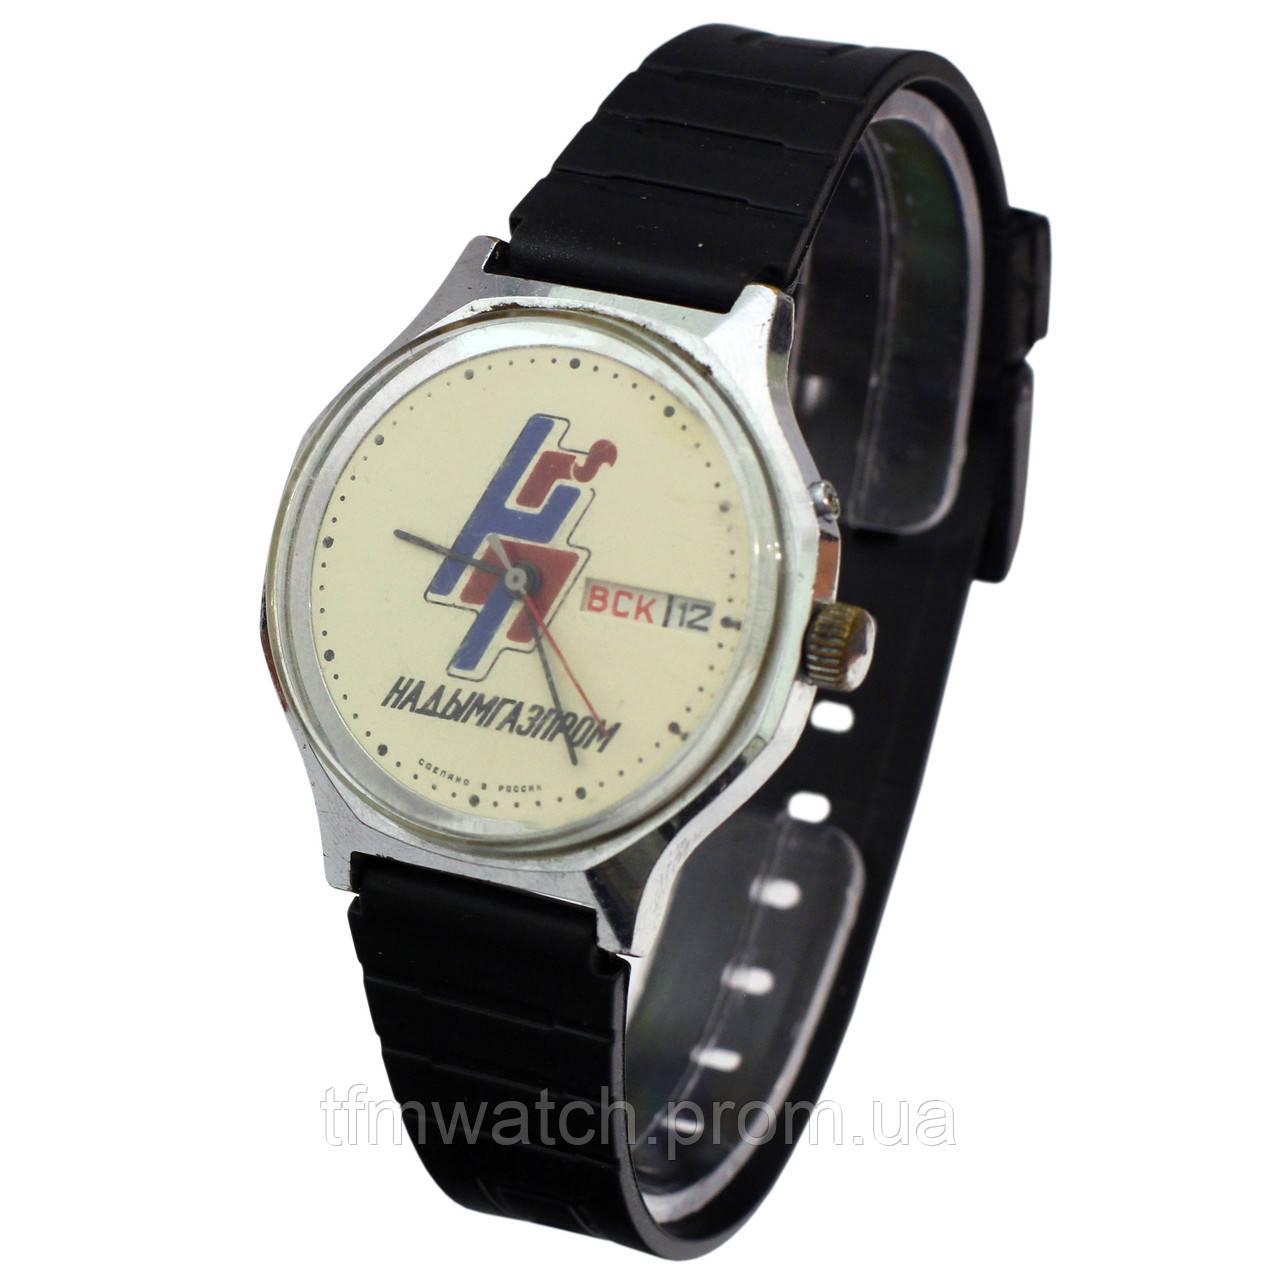 Часы Слава Надымгазпром